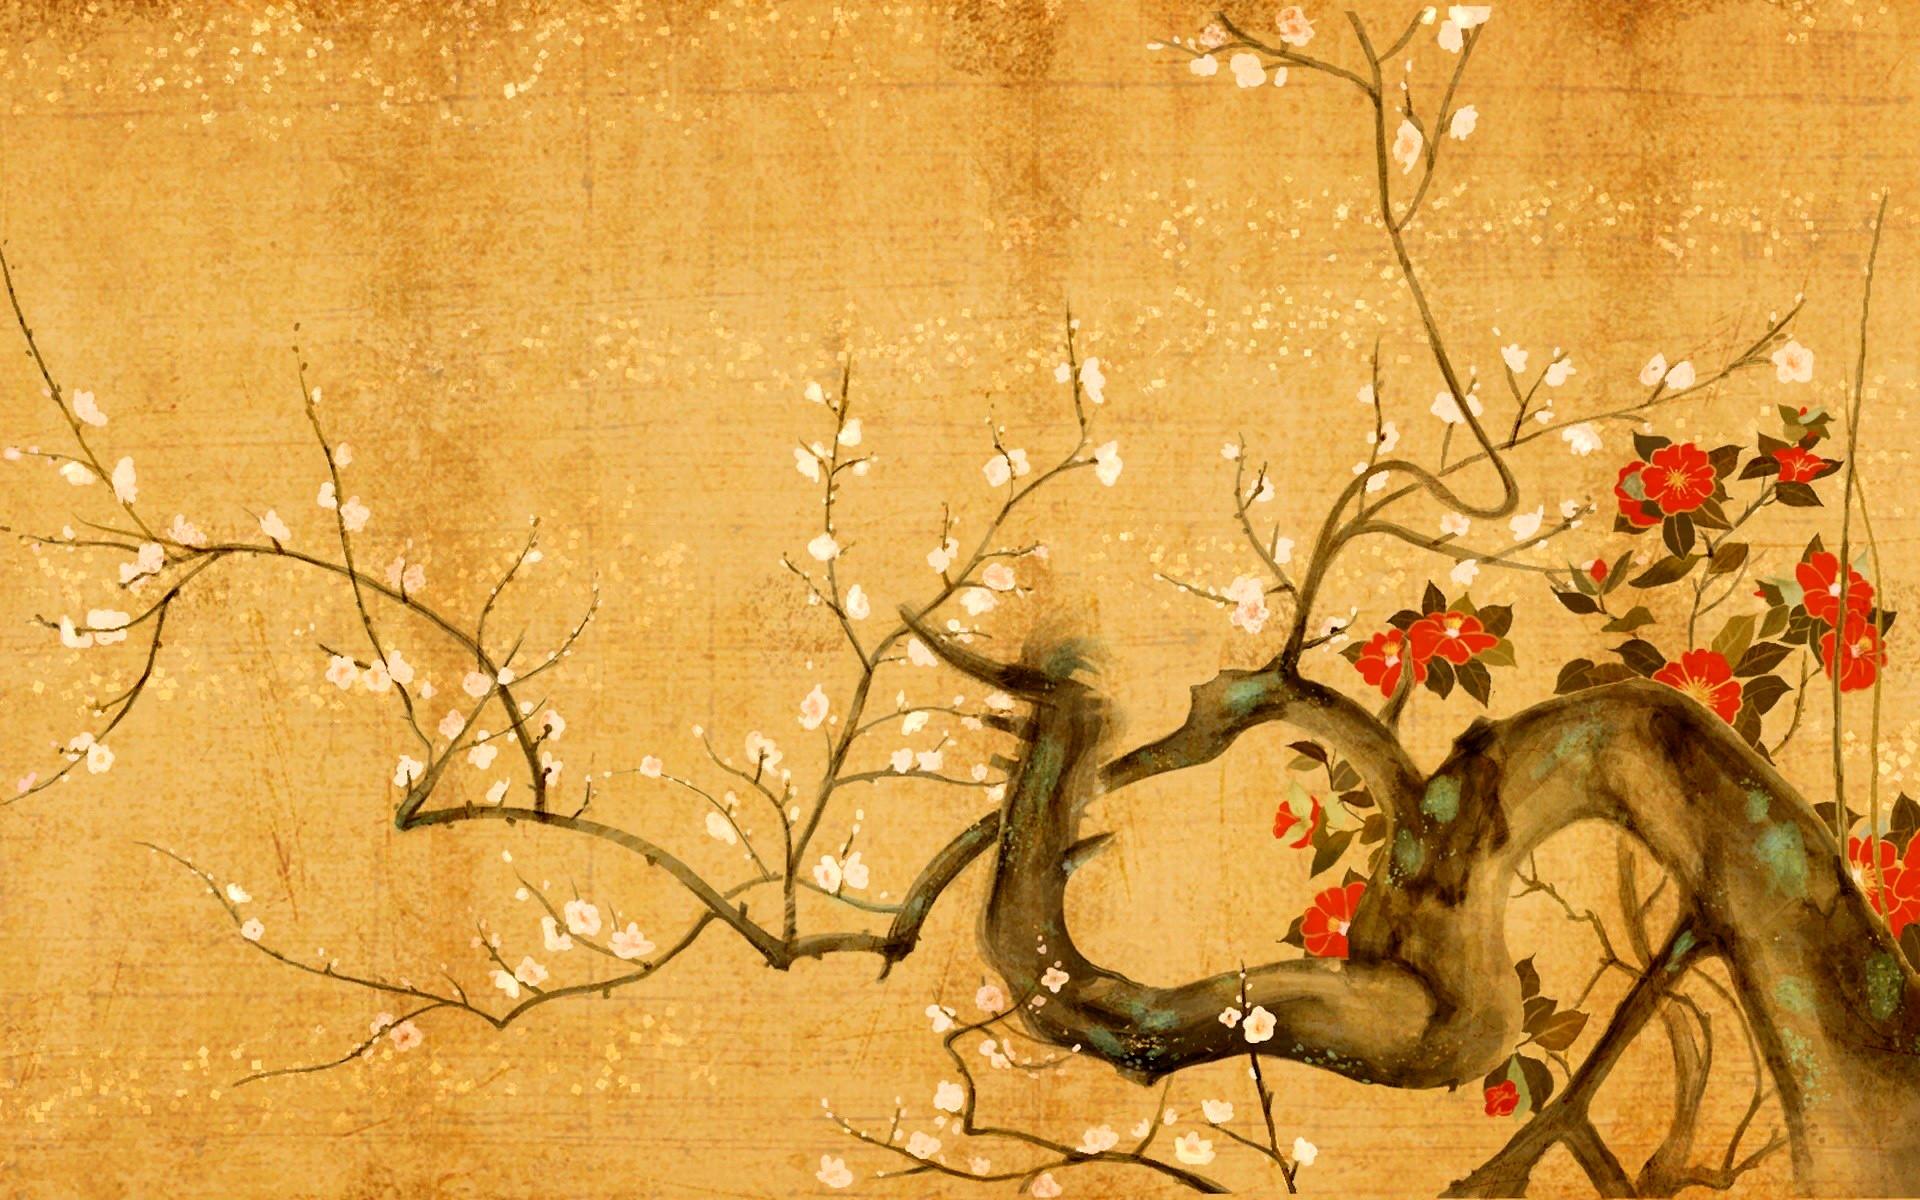 Total War Shogun 2 Fall Of The Samurai Wallpaper Hd Shogun Wallpaper 183 ① Wallpapertag